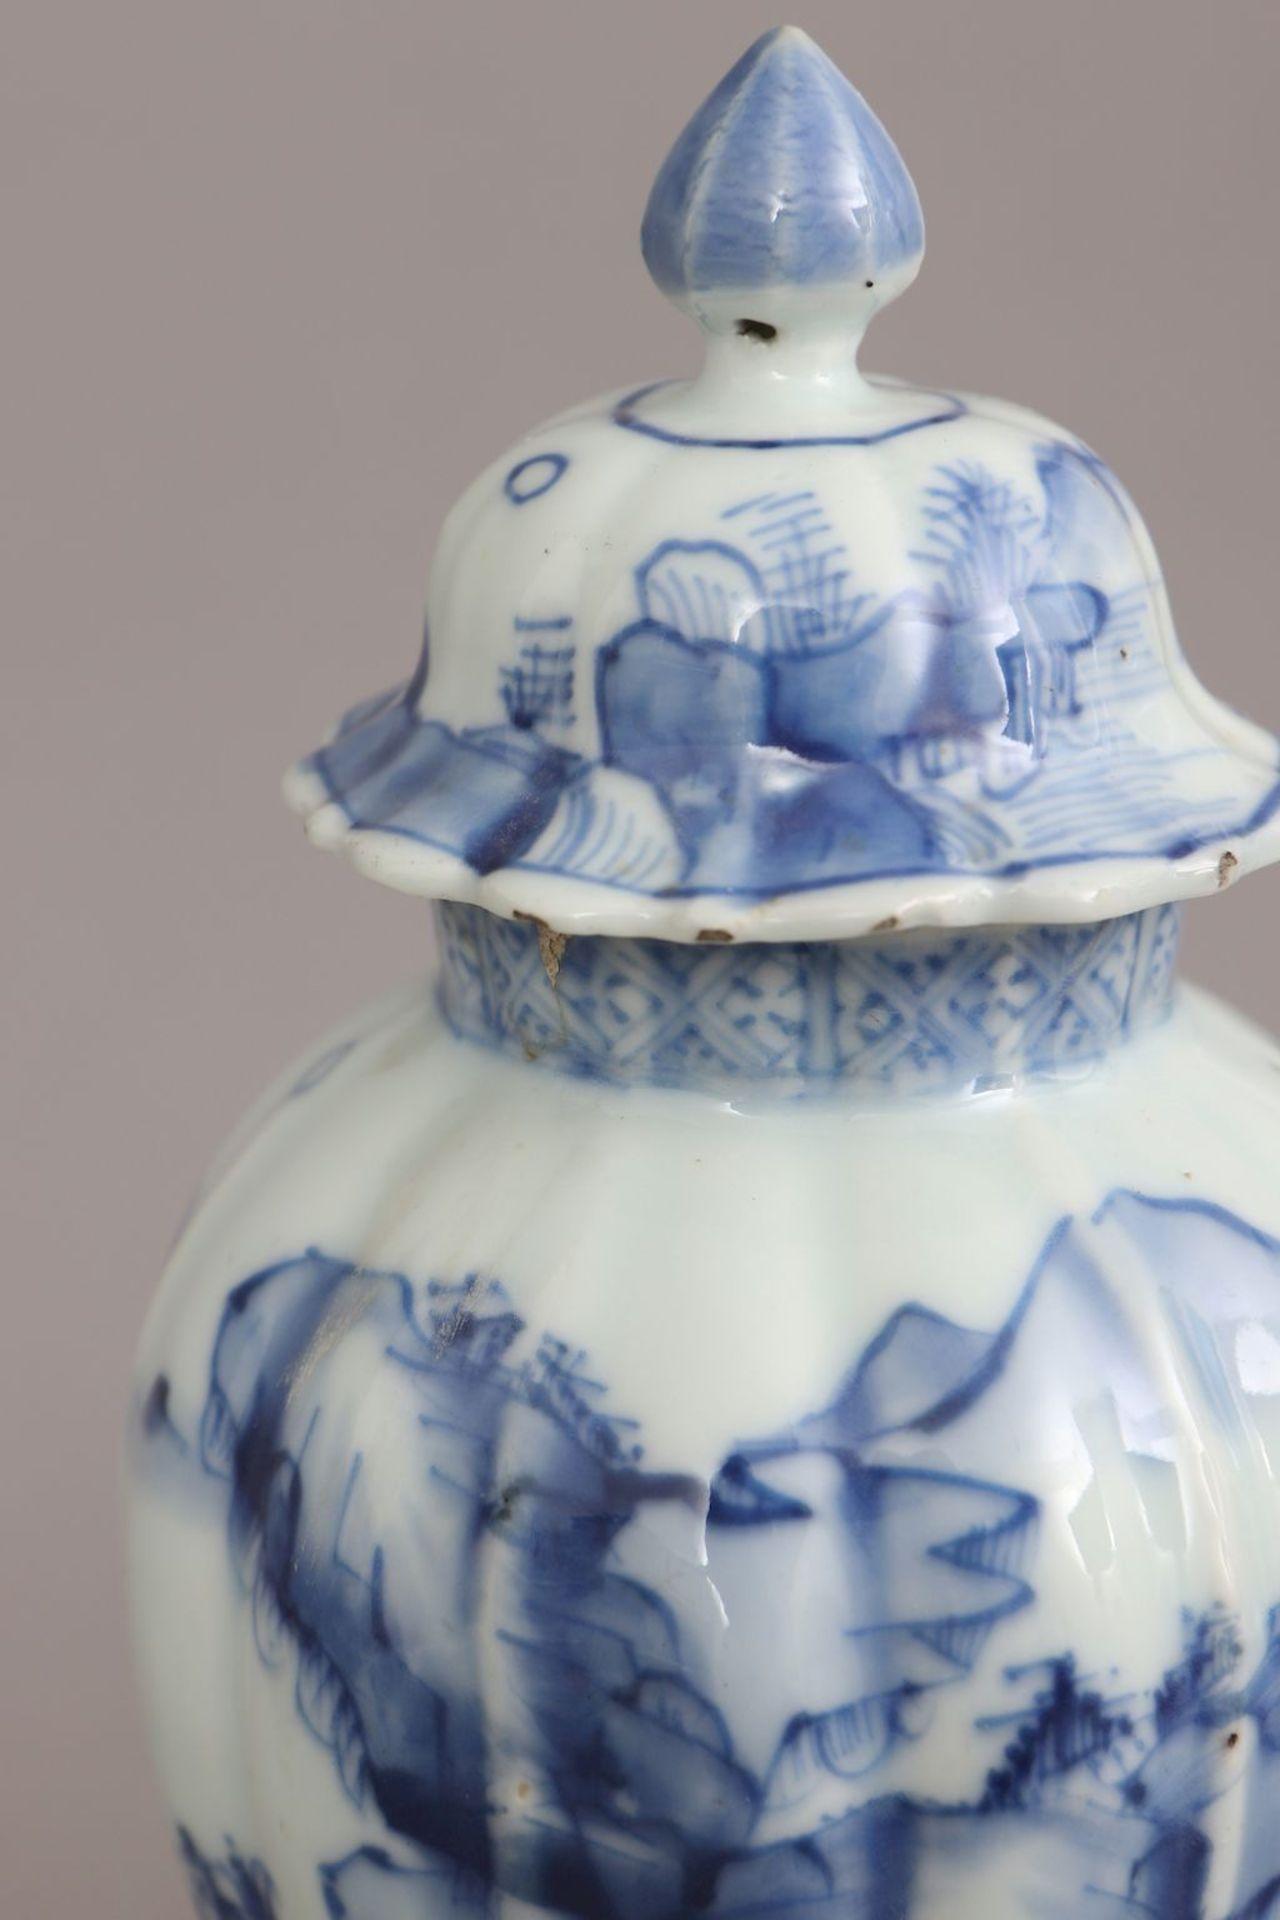 Chinesisches Vasengefäß mit Blaumalerei - Image 4 of 5